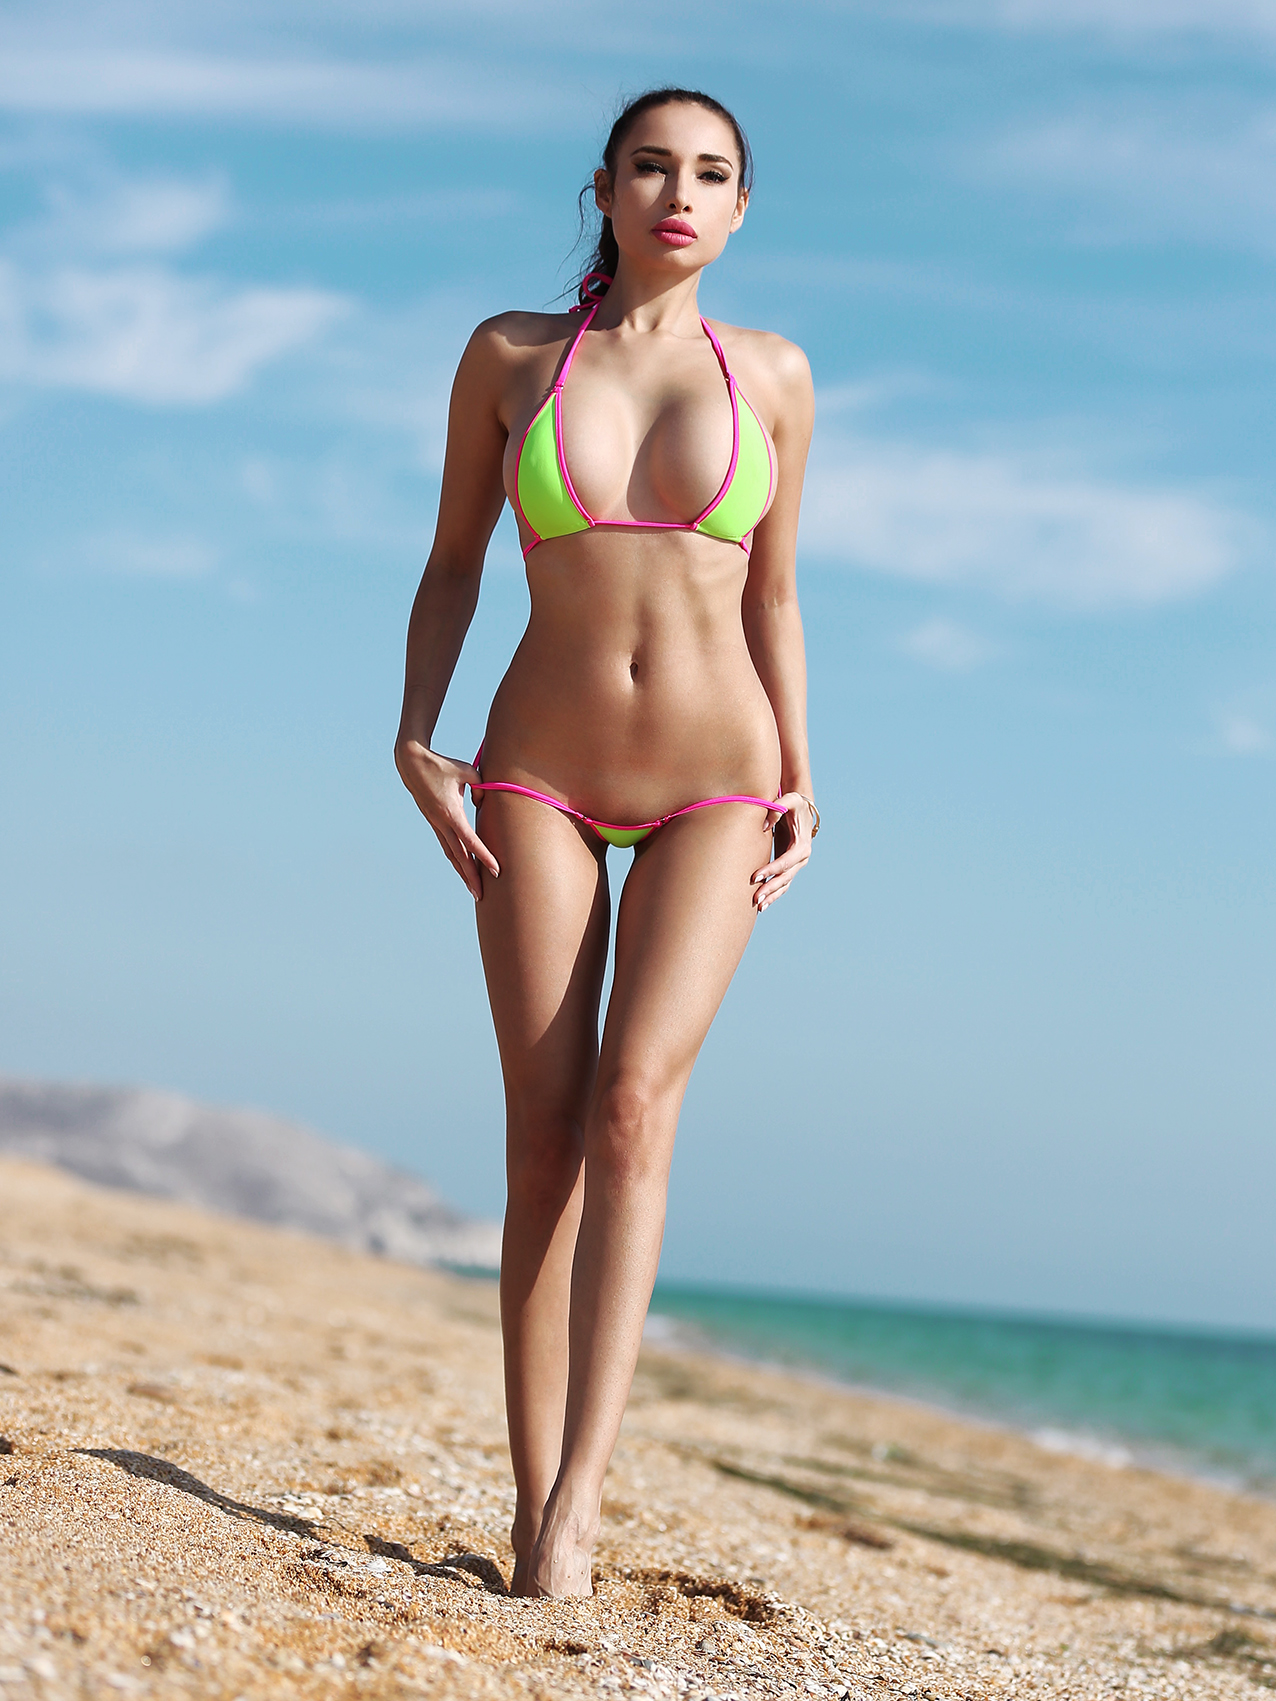 Most fashion hot sexy designer extreme swimwear mini micro bikini thong